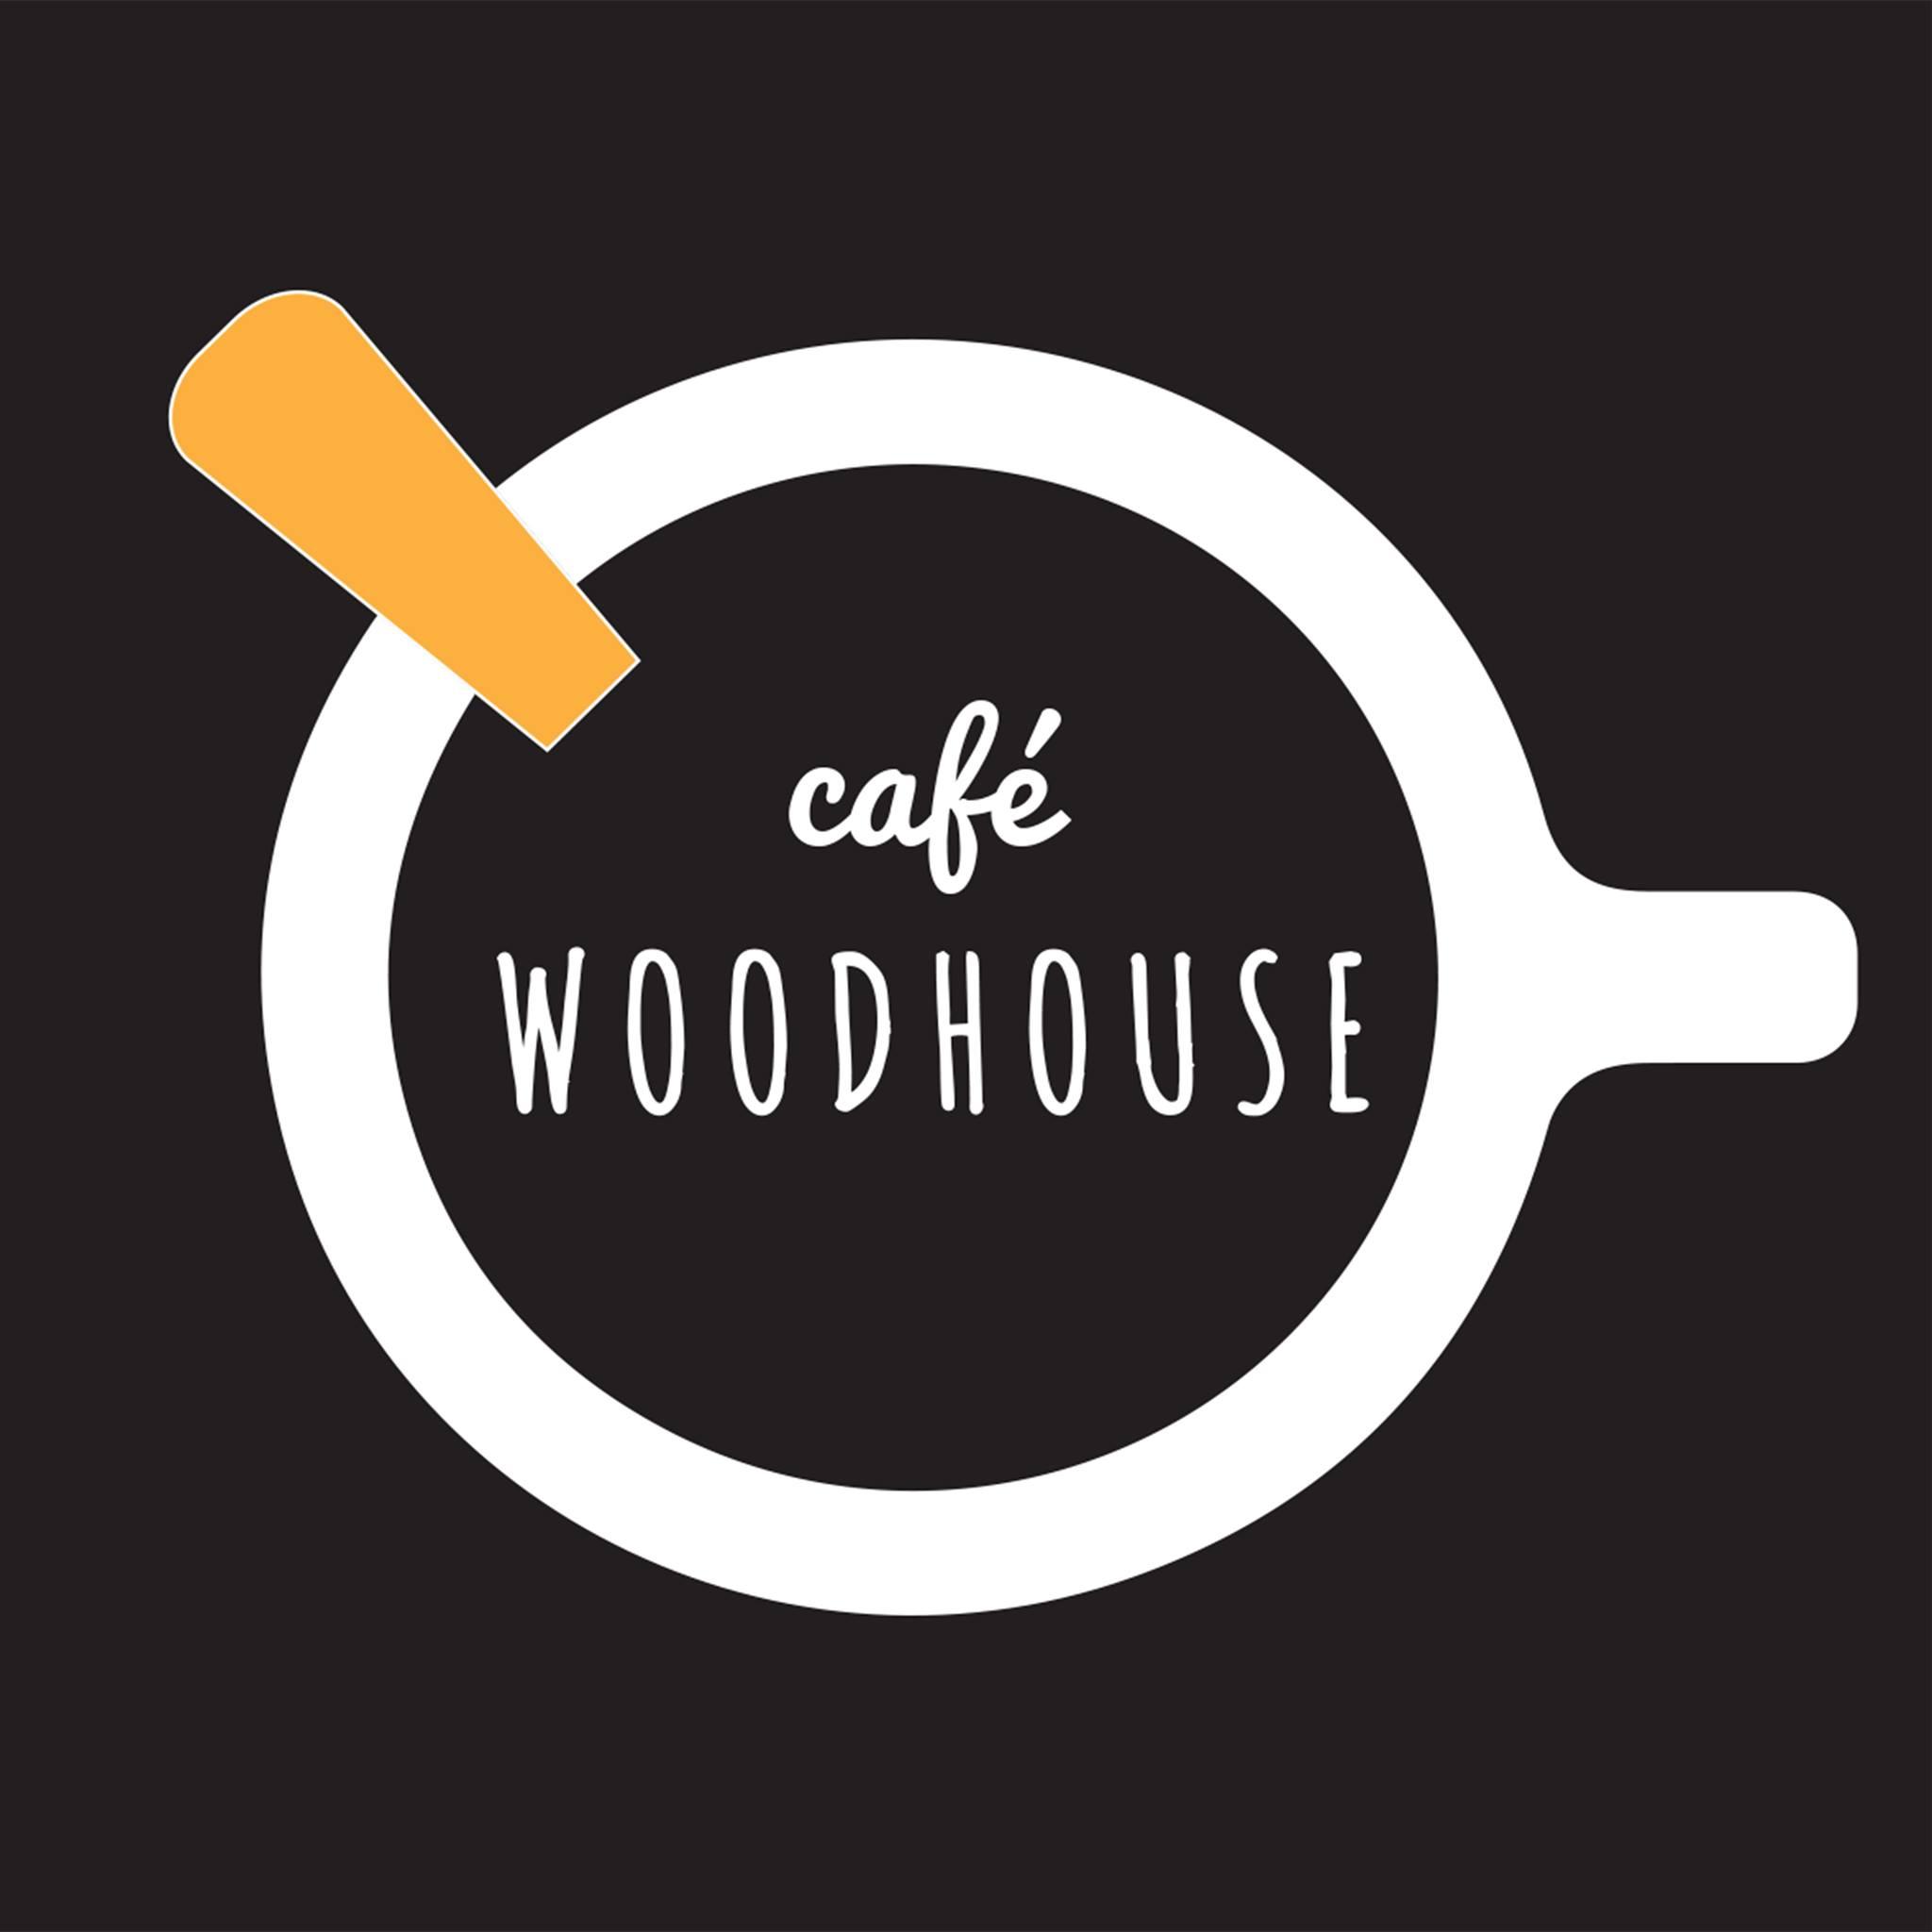 Cafe Woodhouse